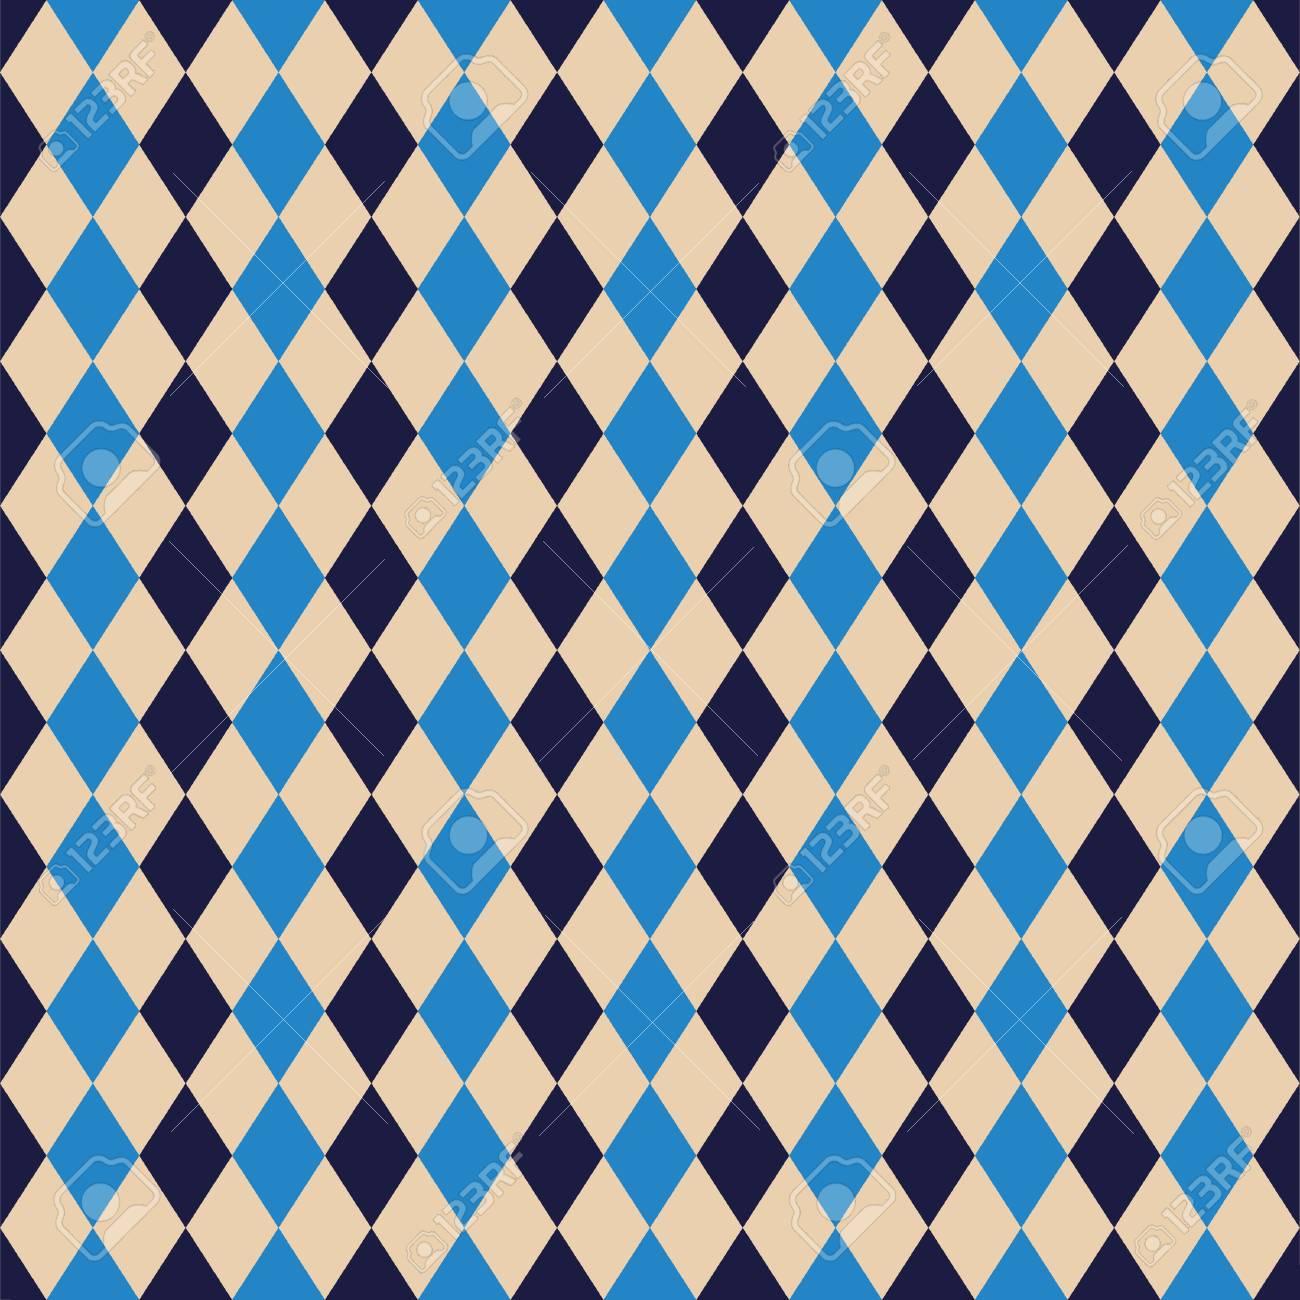 Seamless Argyle Diamond Harlequin Pattern Texture Background Wallpaper Stock Vector